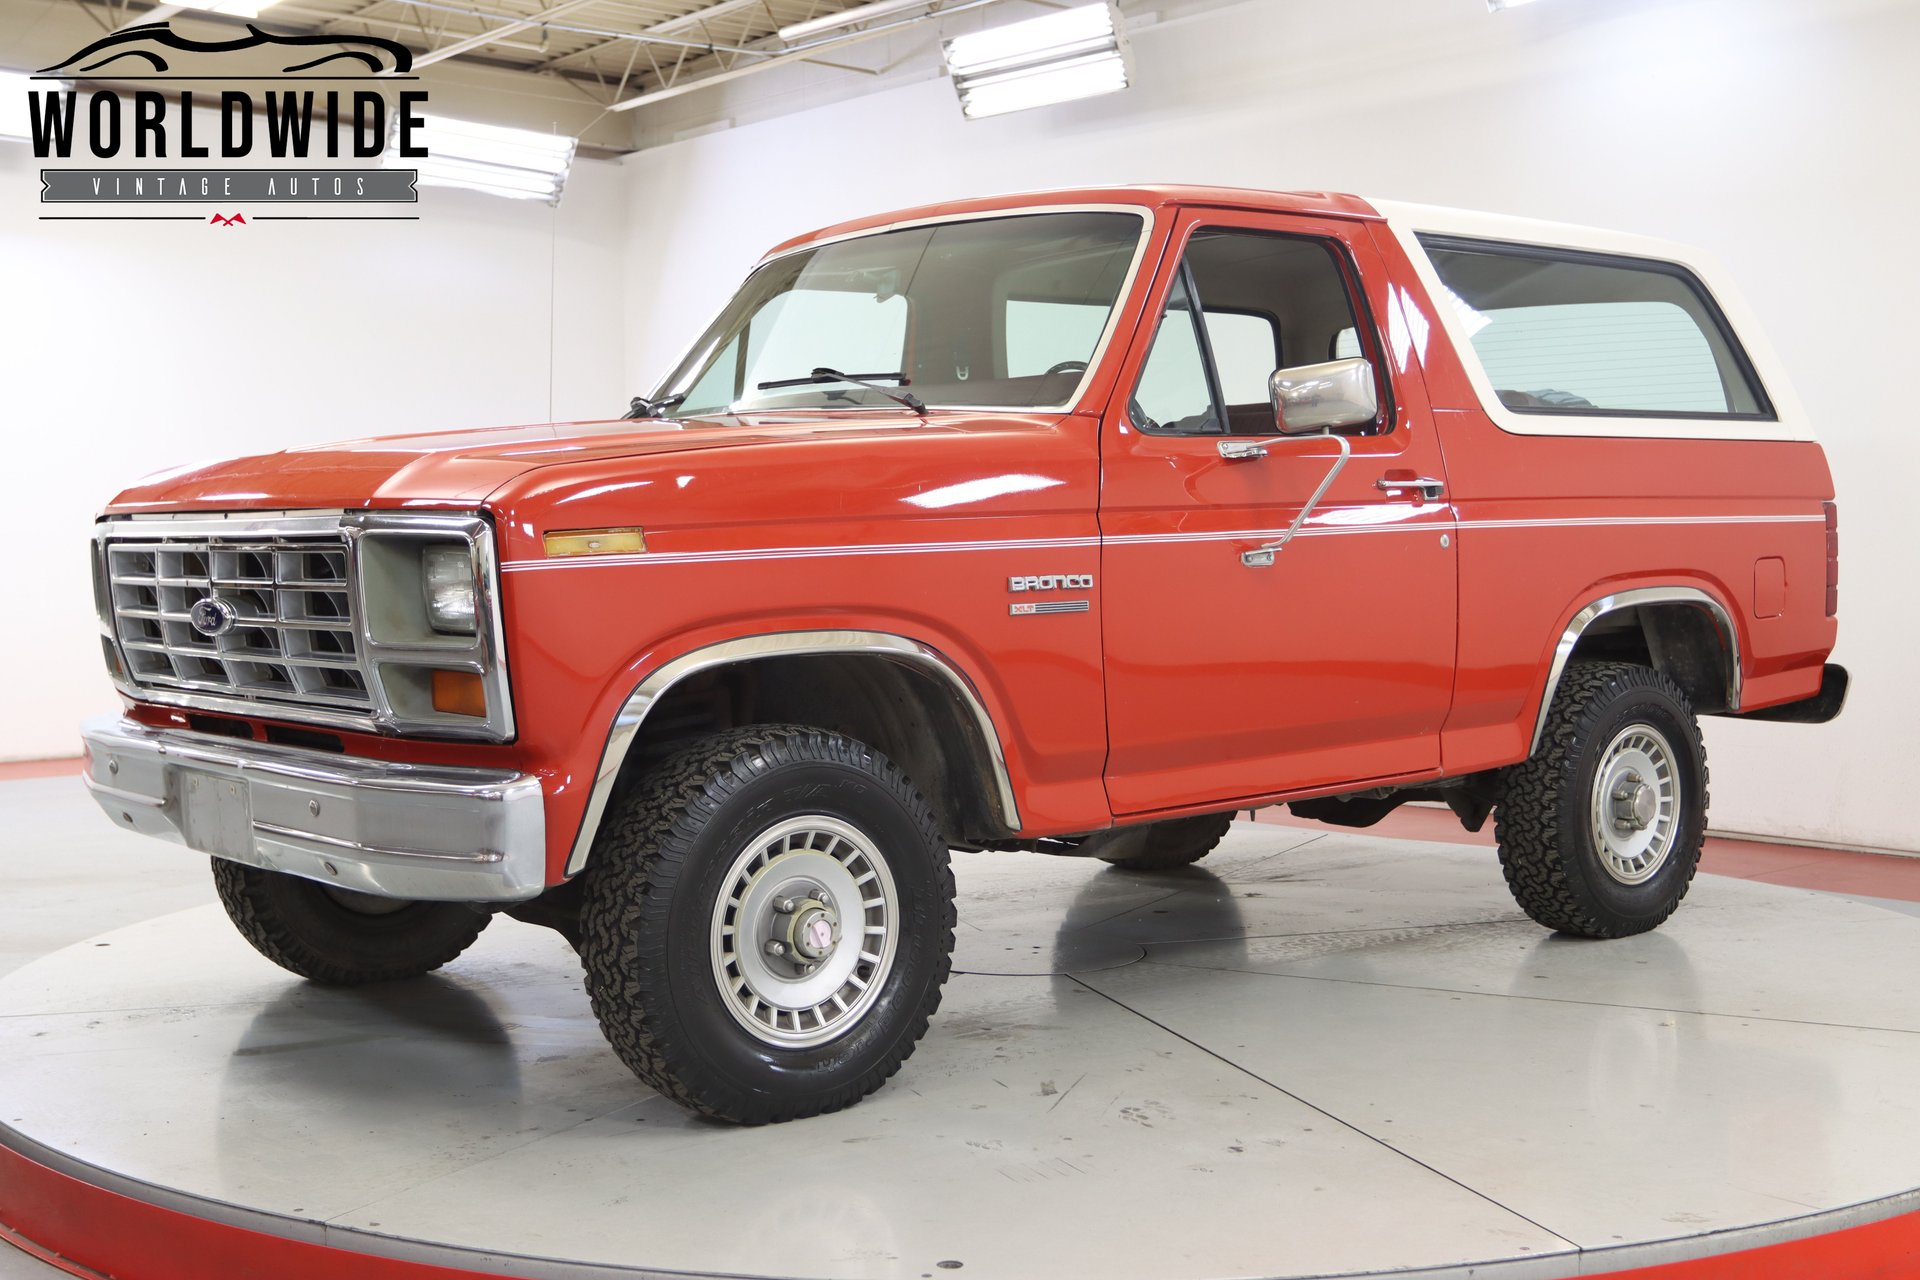 1985 Ford Bronco Worldwide Vintage Autos